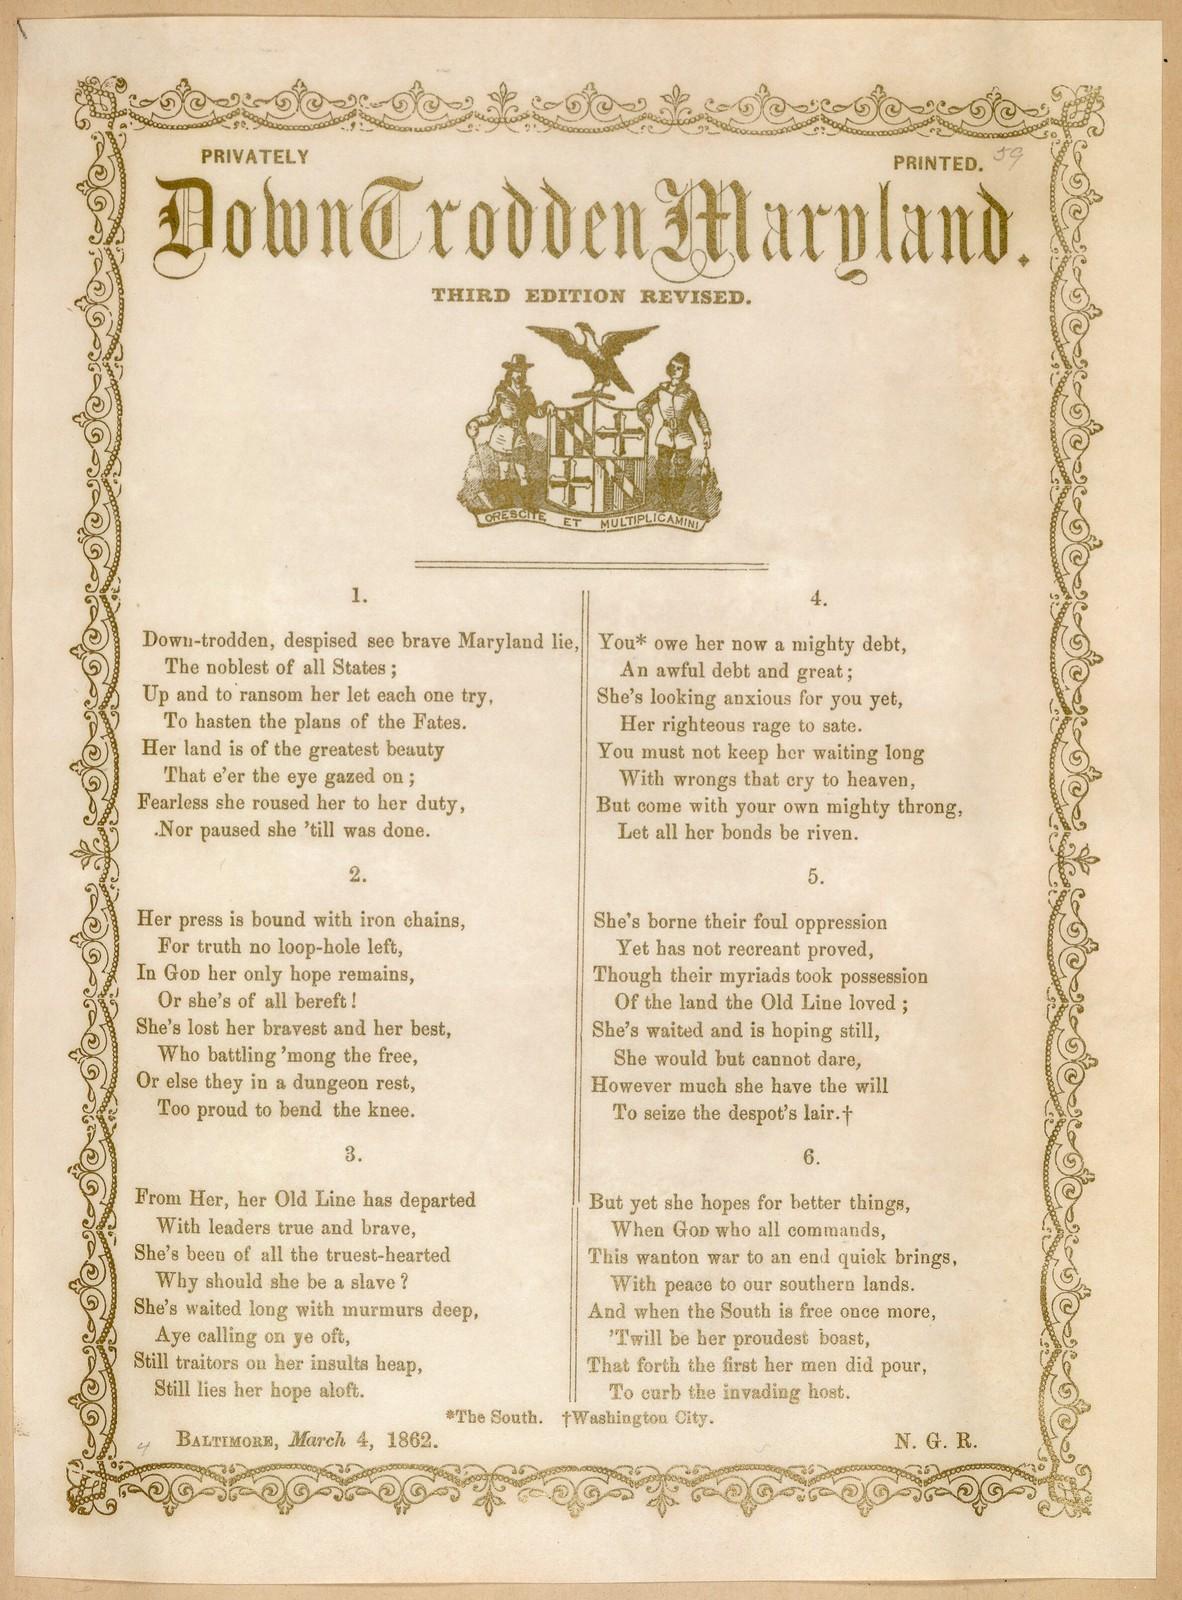 Down trodden Maryland. Third edition revised. Baltimore, March 4, 1862